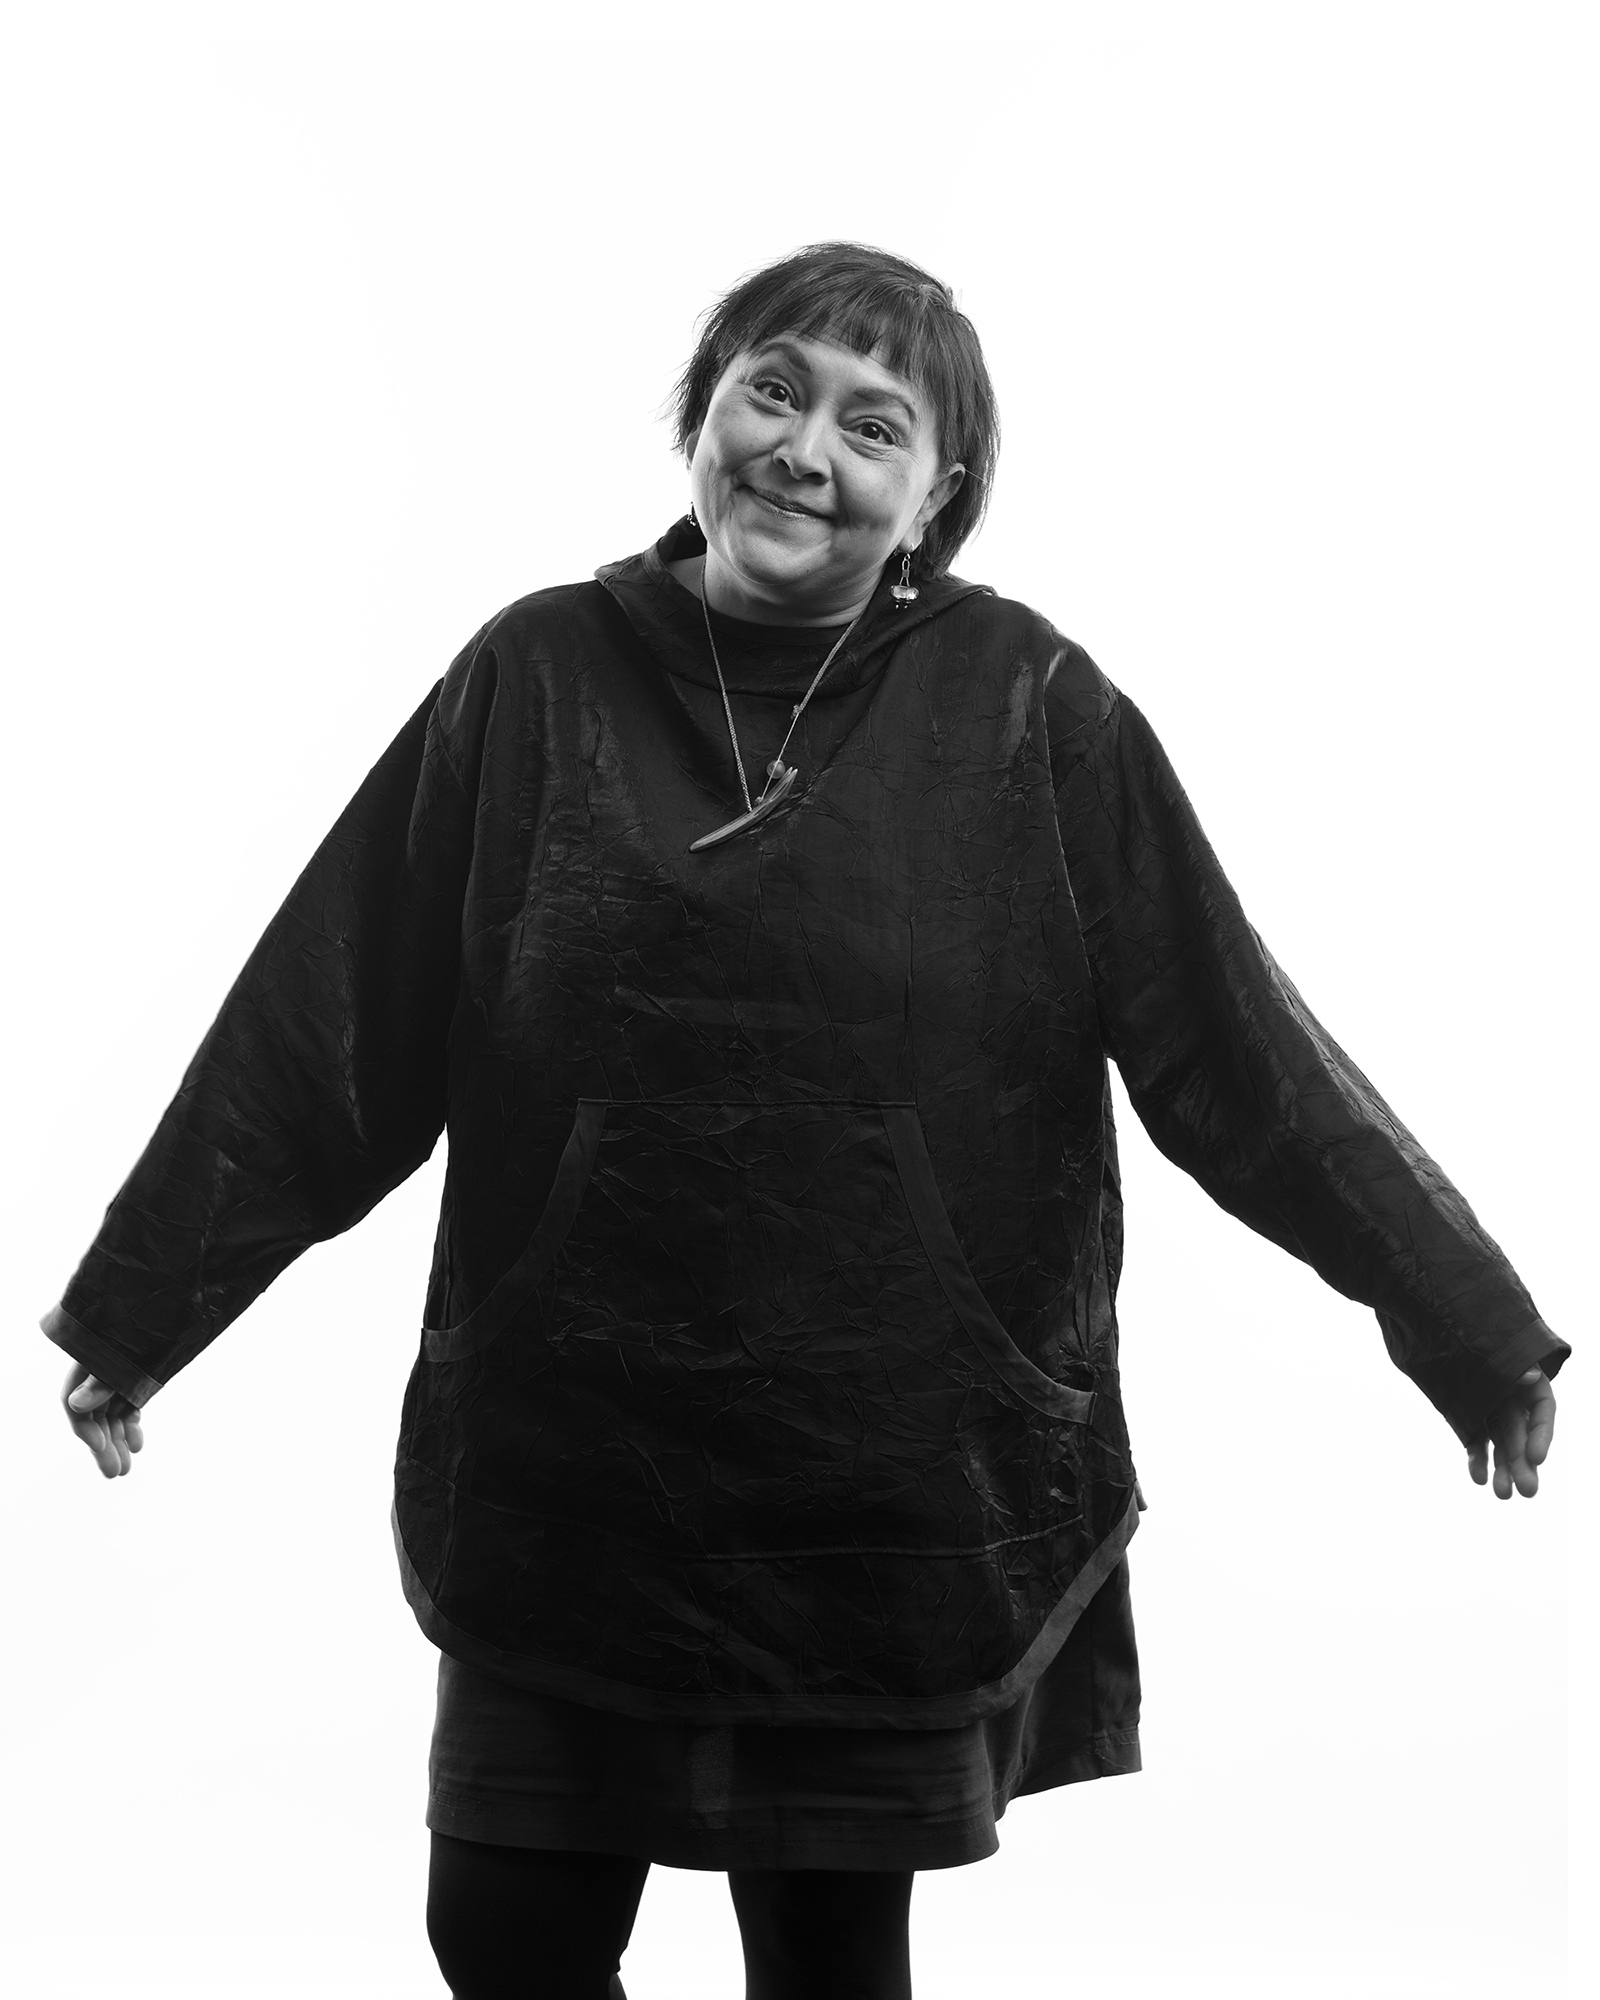 Sonya Kelliher-Combs Visuel artist, USA (c) Knut Åserud/Arctic Arts Festival